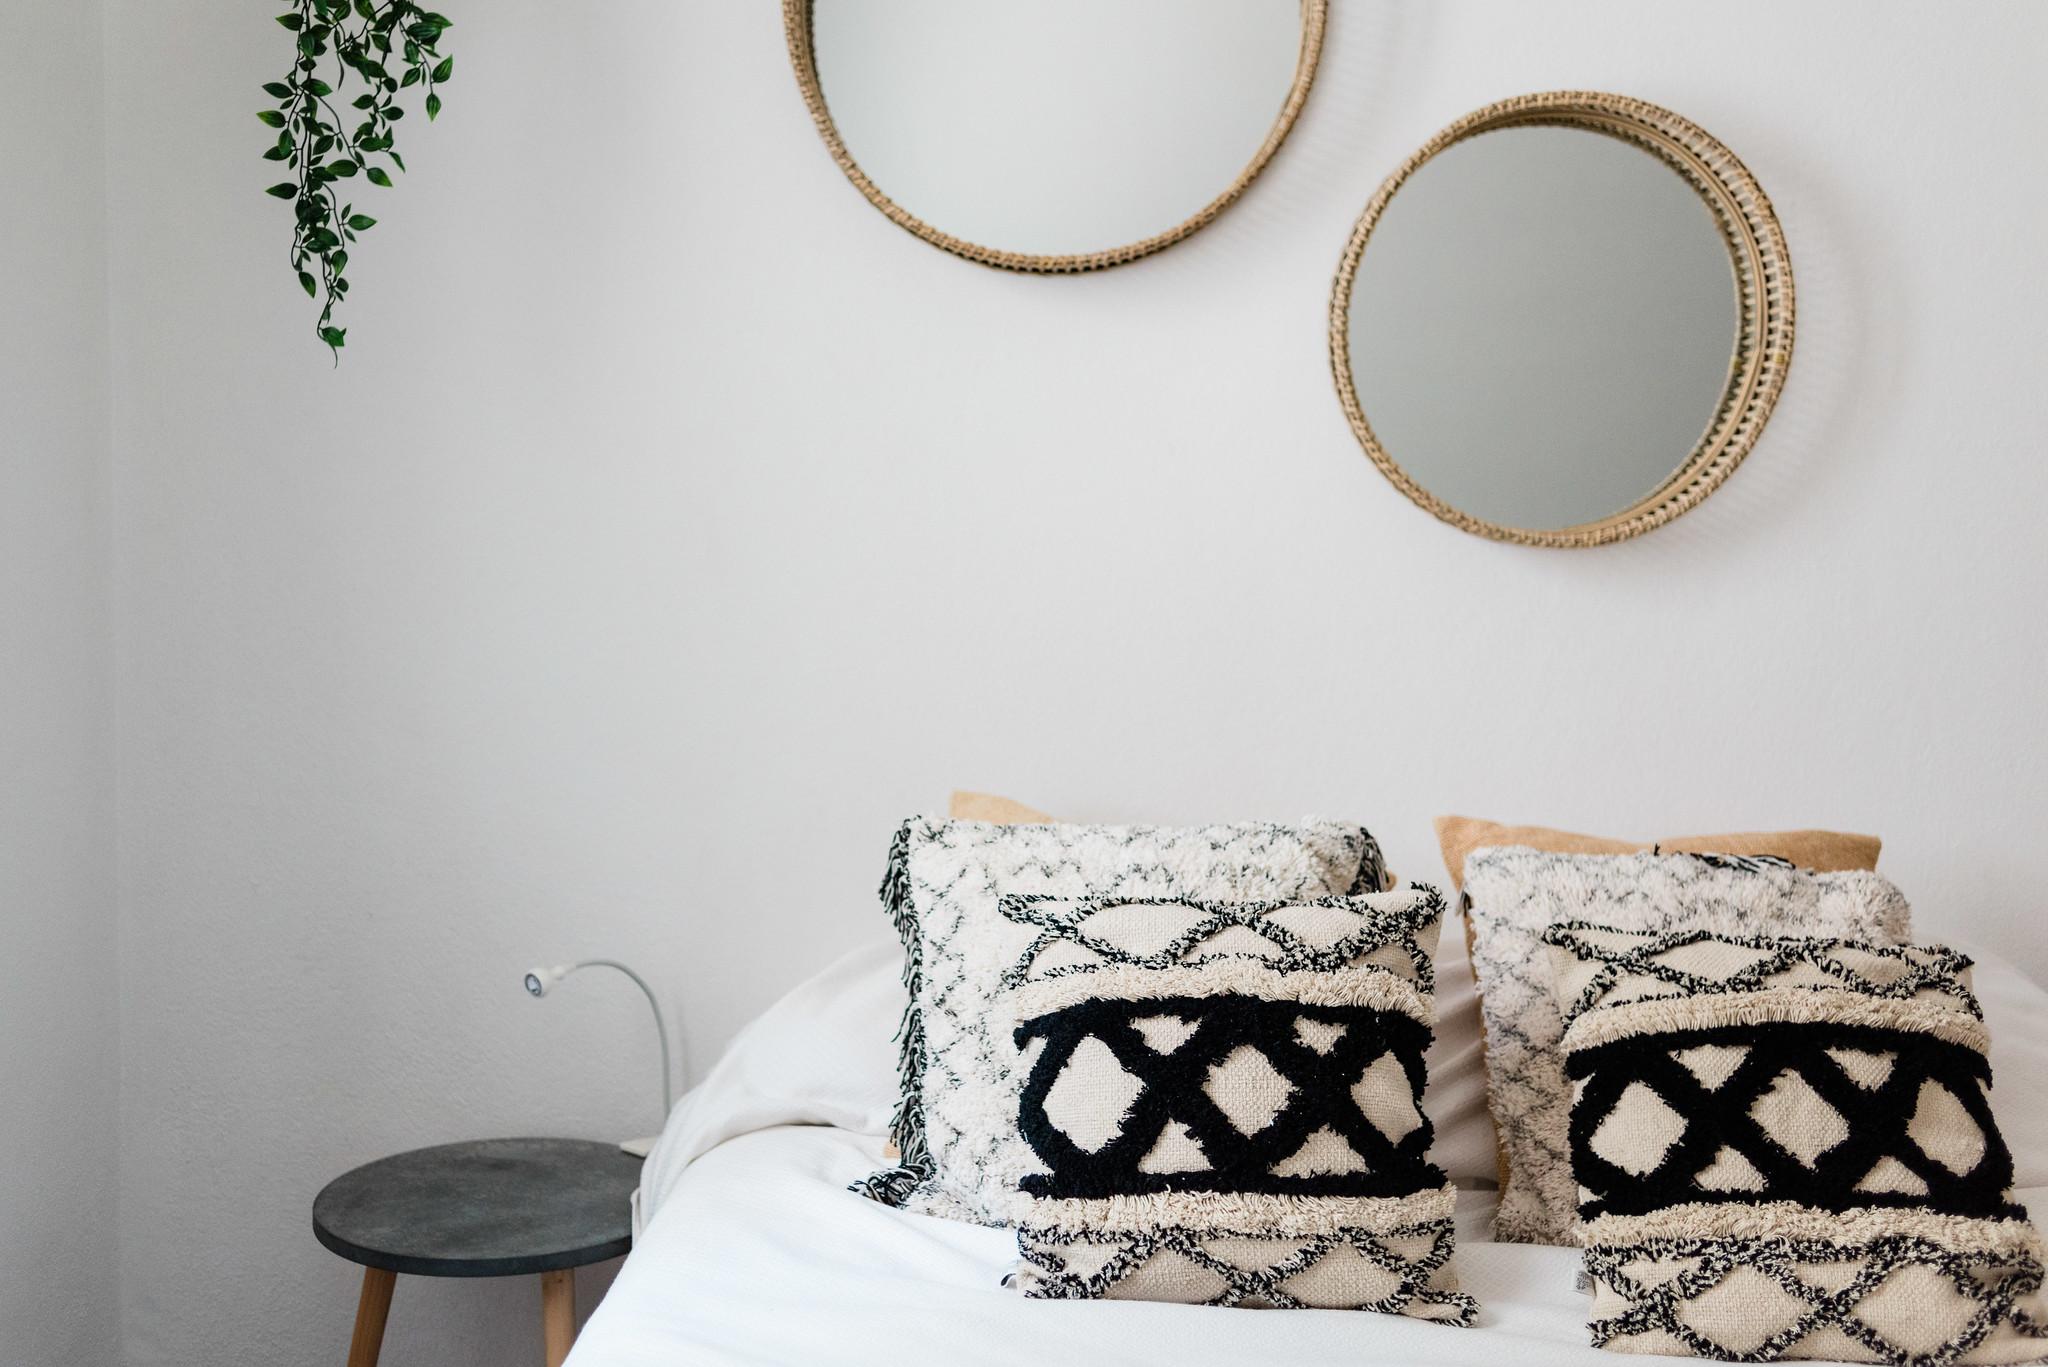 https://www.white-ibiza.com/wp-content/uploads/2020/05/white-ibiza-villas-can-verde-interior-bedroom2.jpg